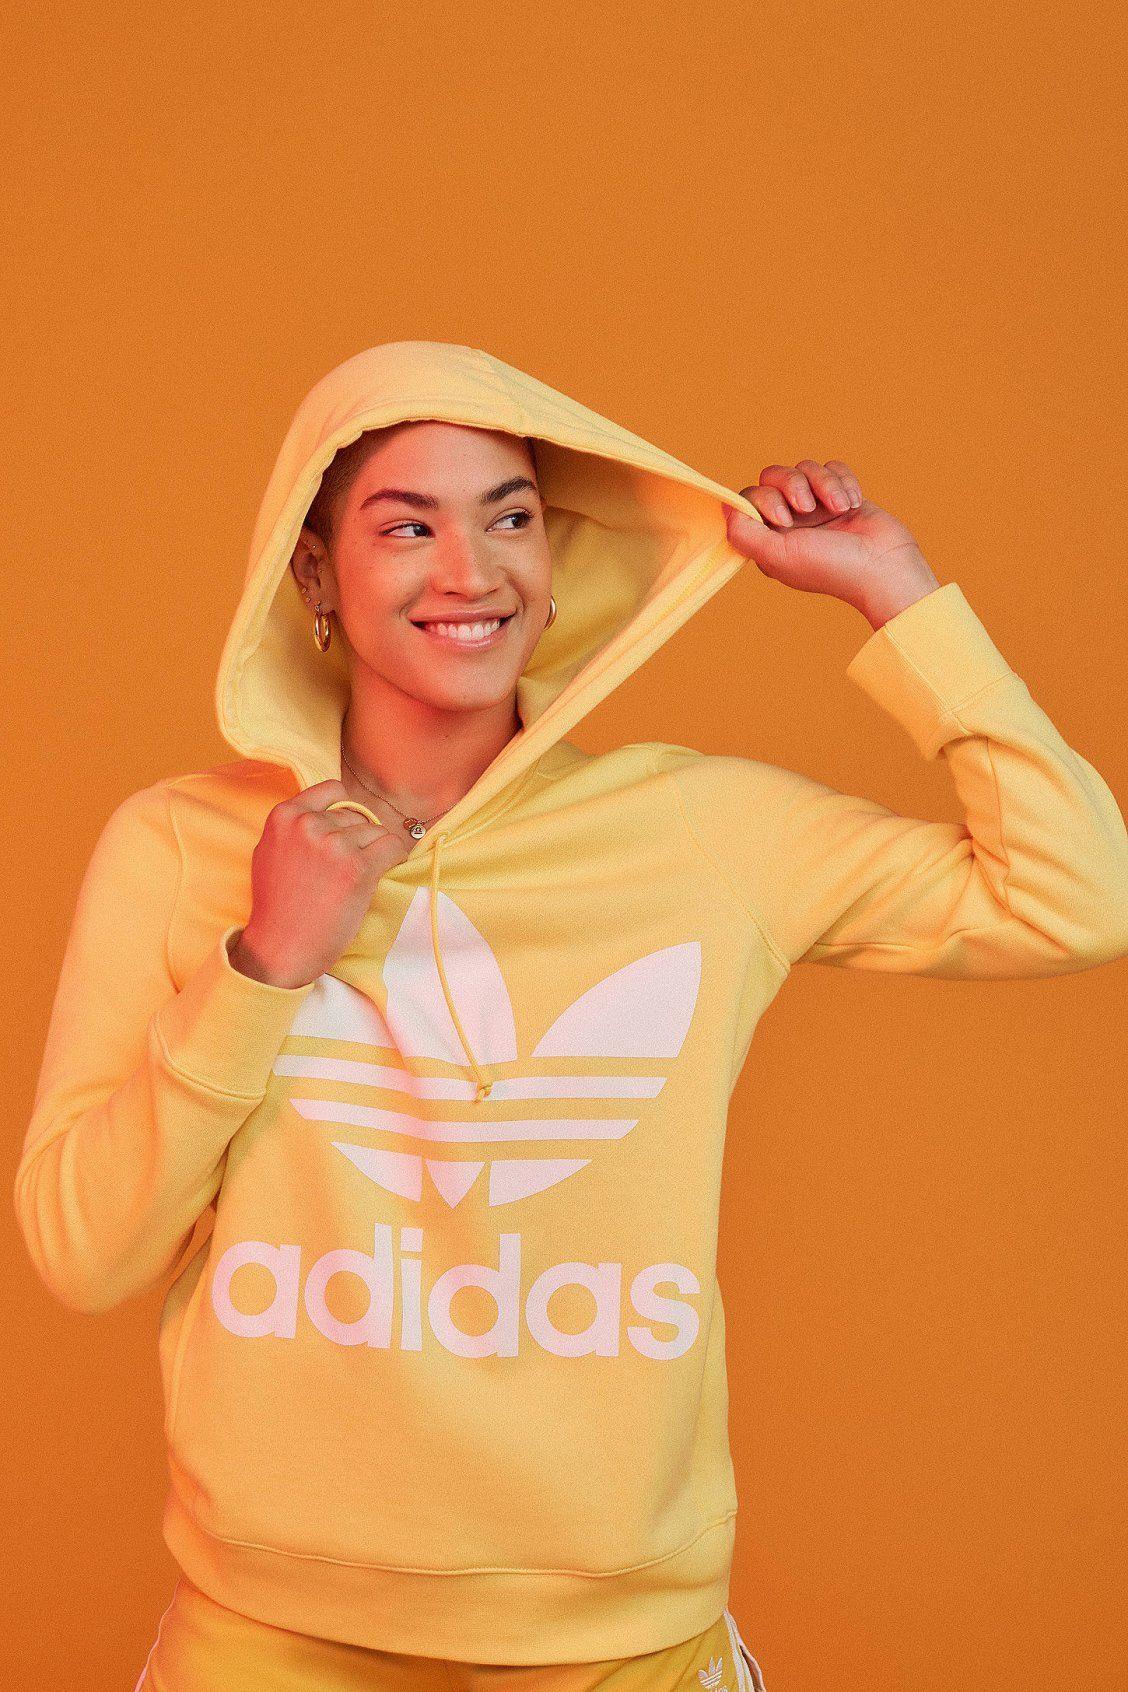 d4f038c7a85b adidas Originals Adicolor Classic Trefoil Hoodie Sweatshirt | Urban  Outfitters